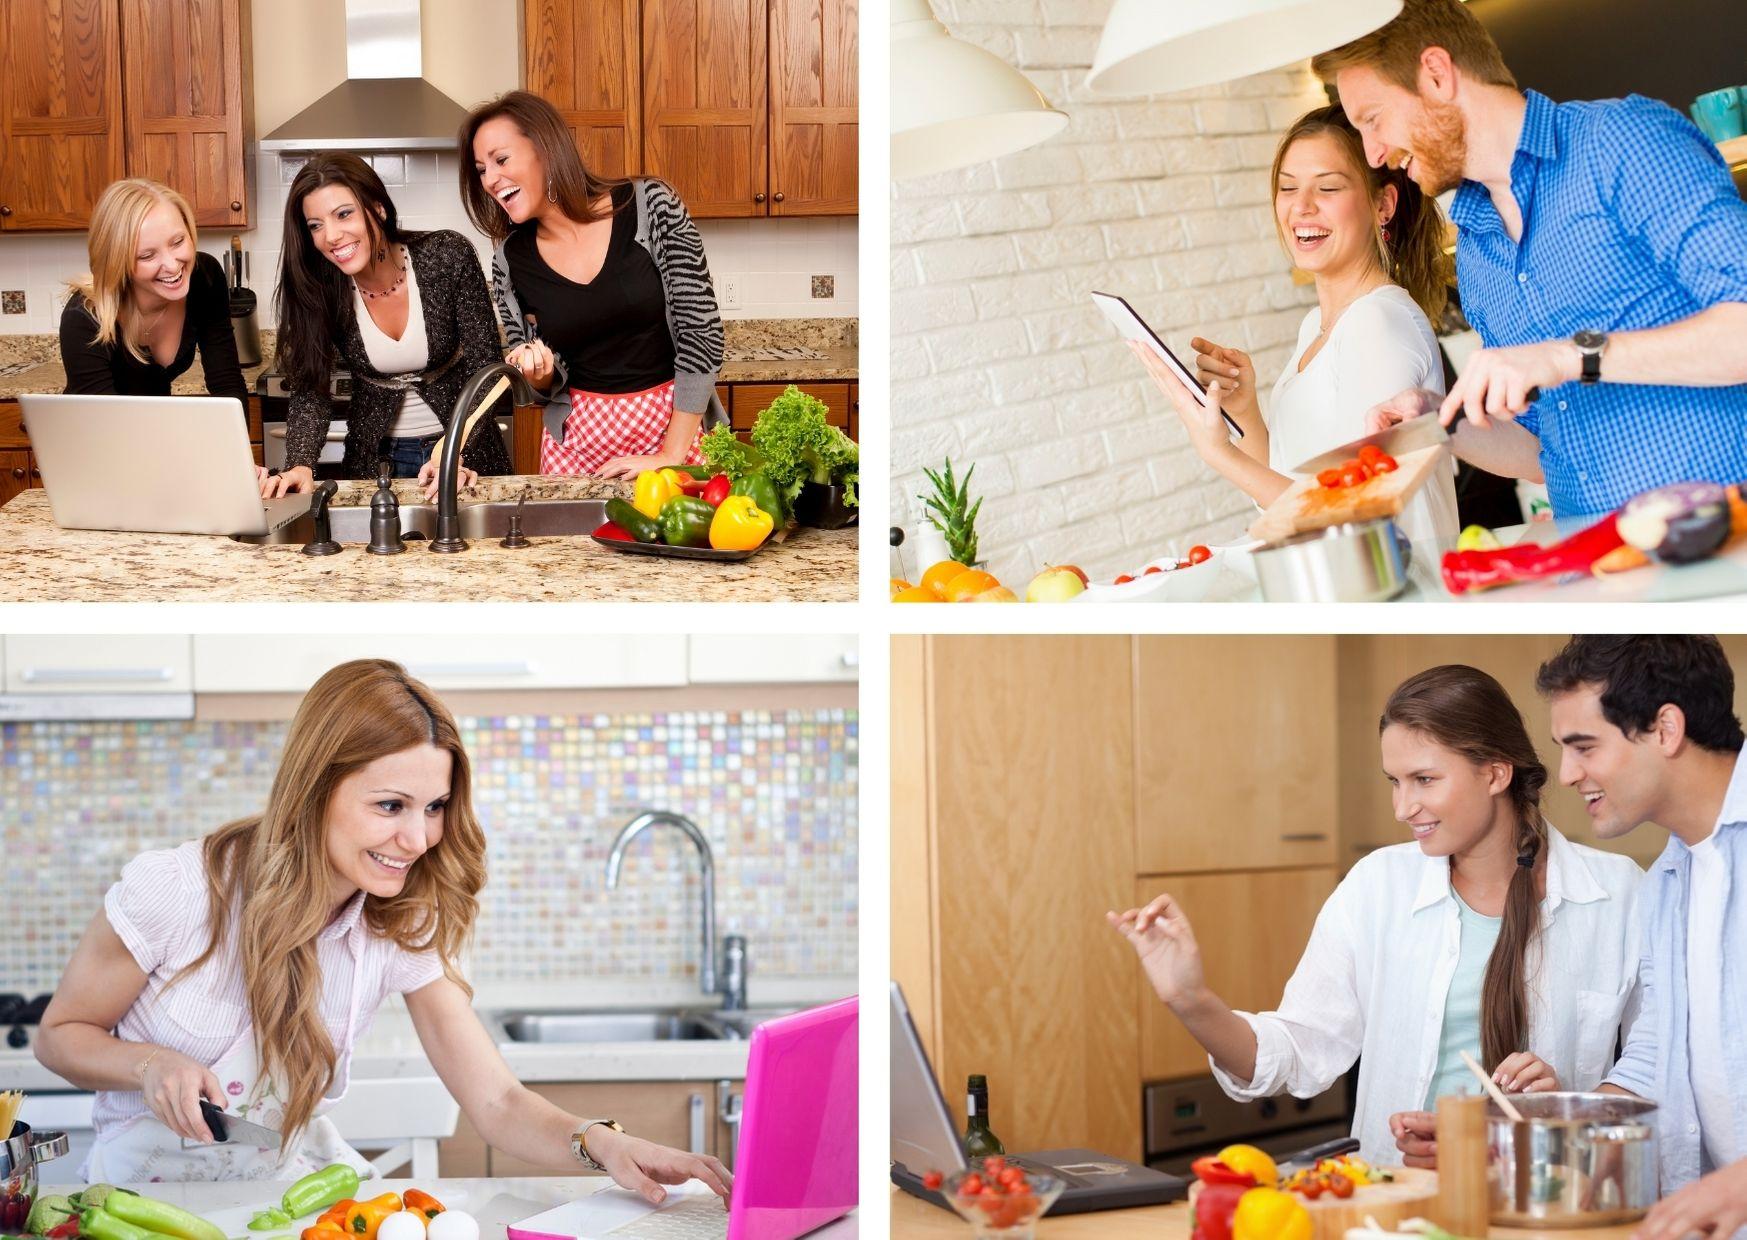 Remote kochen, virtuelles Teamevent